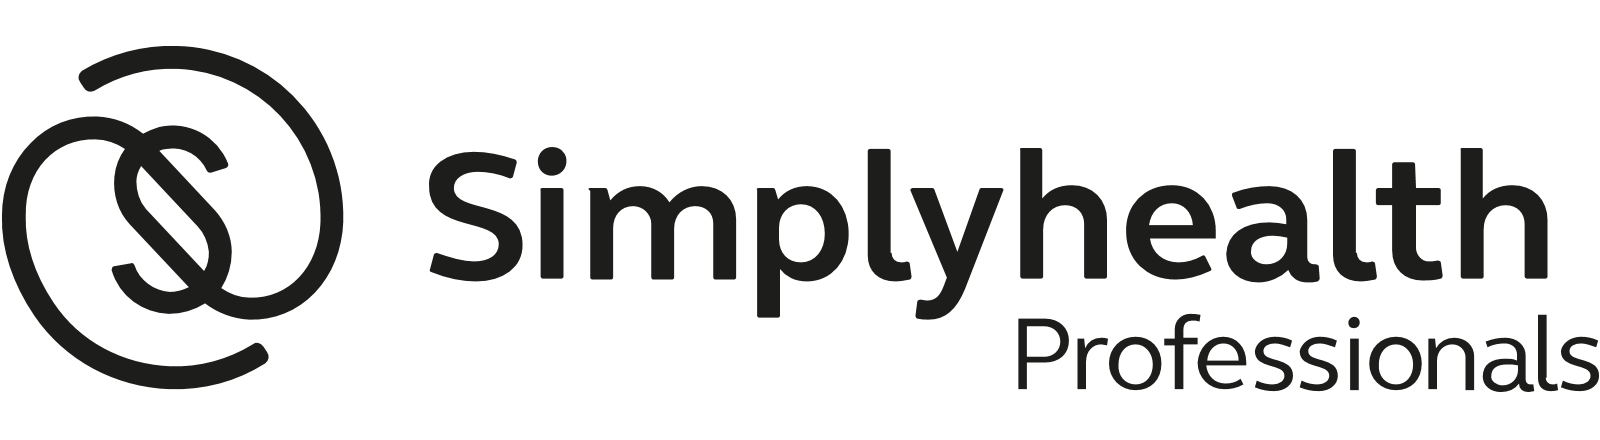 Simplyhealth professionals logo